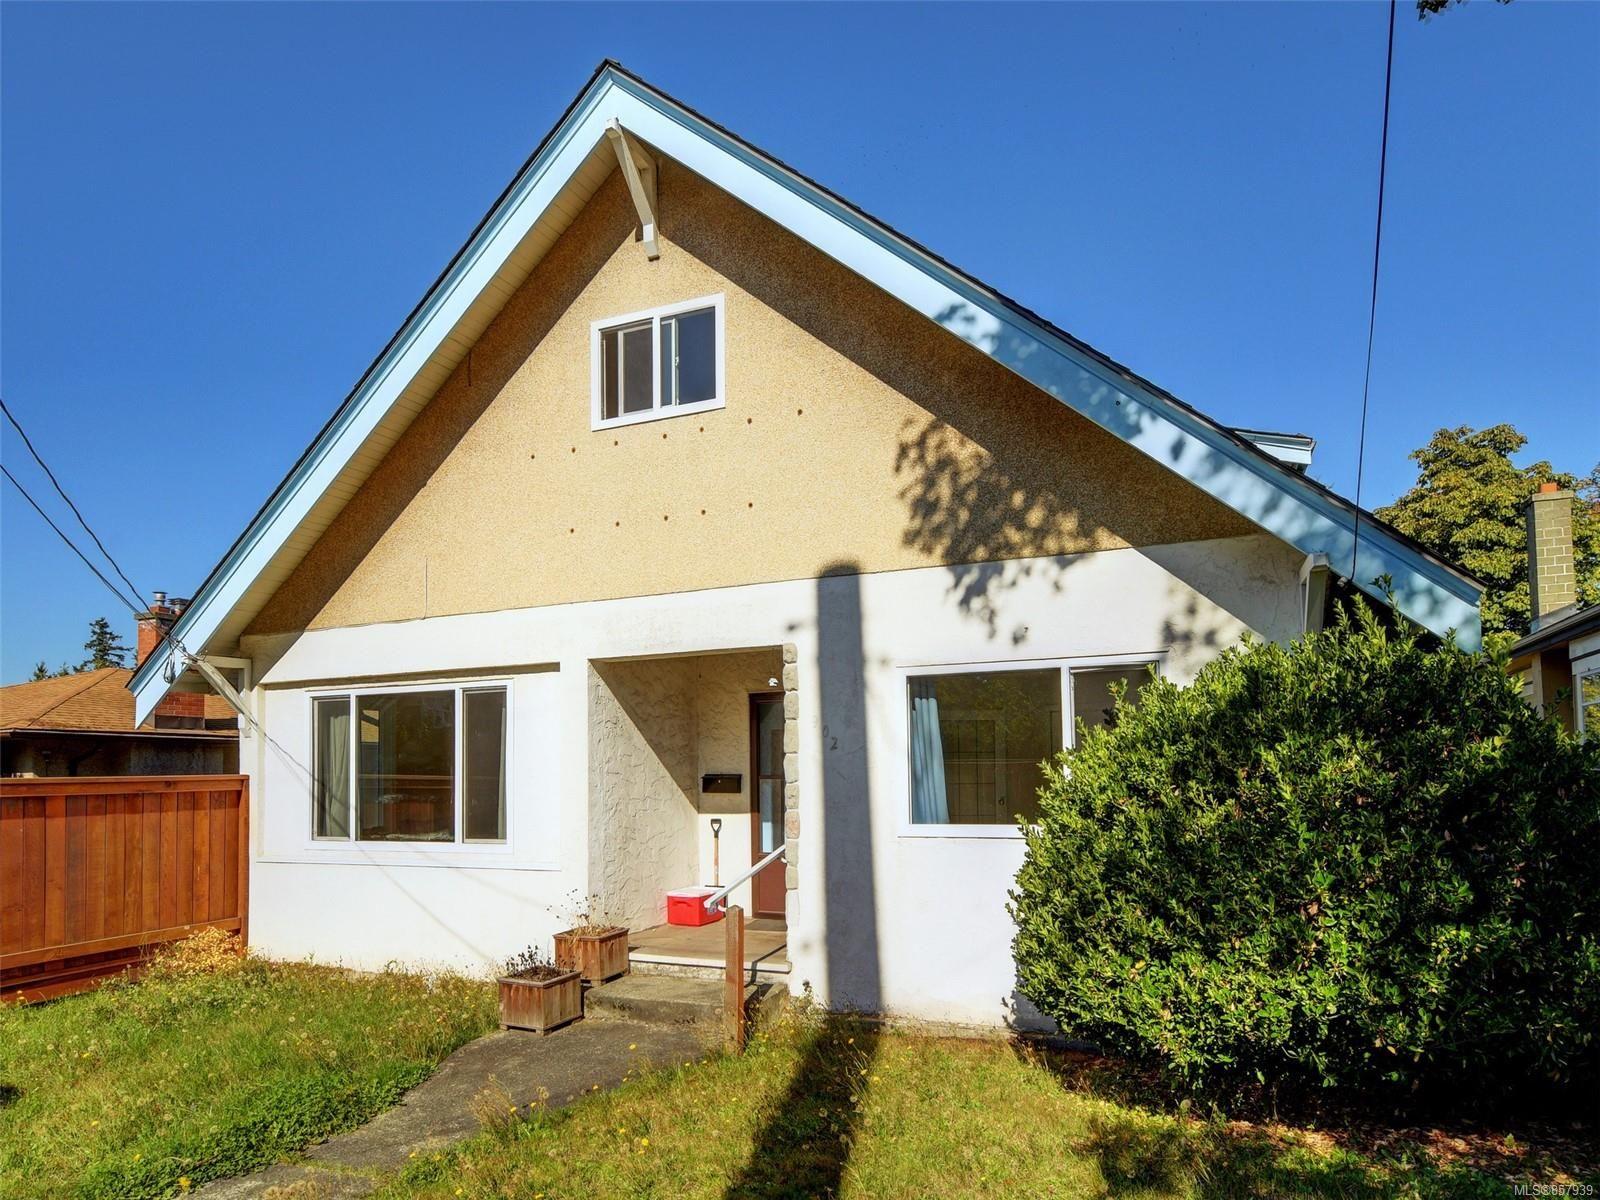 Main Photo: 902 Craigflower Rd in : Es Gorge Vale House for sale (Esquimalt)  : MLS®# 857939